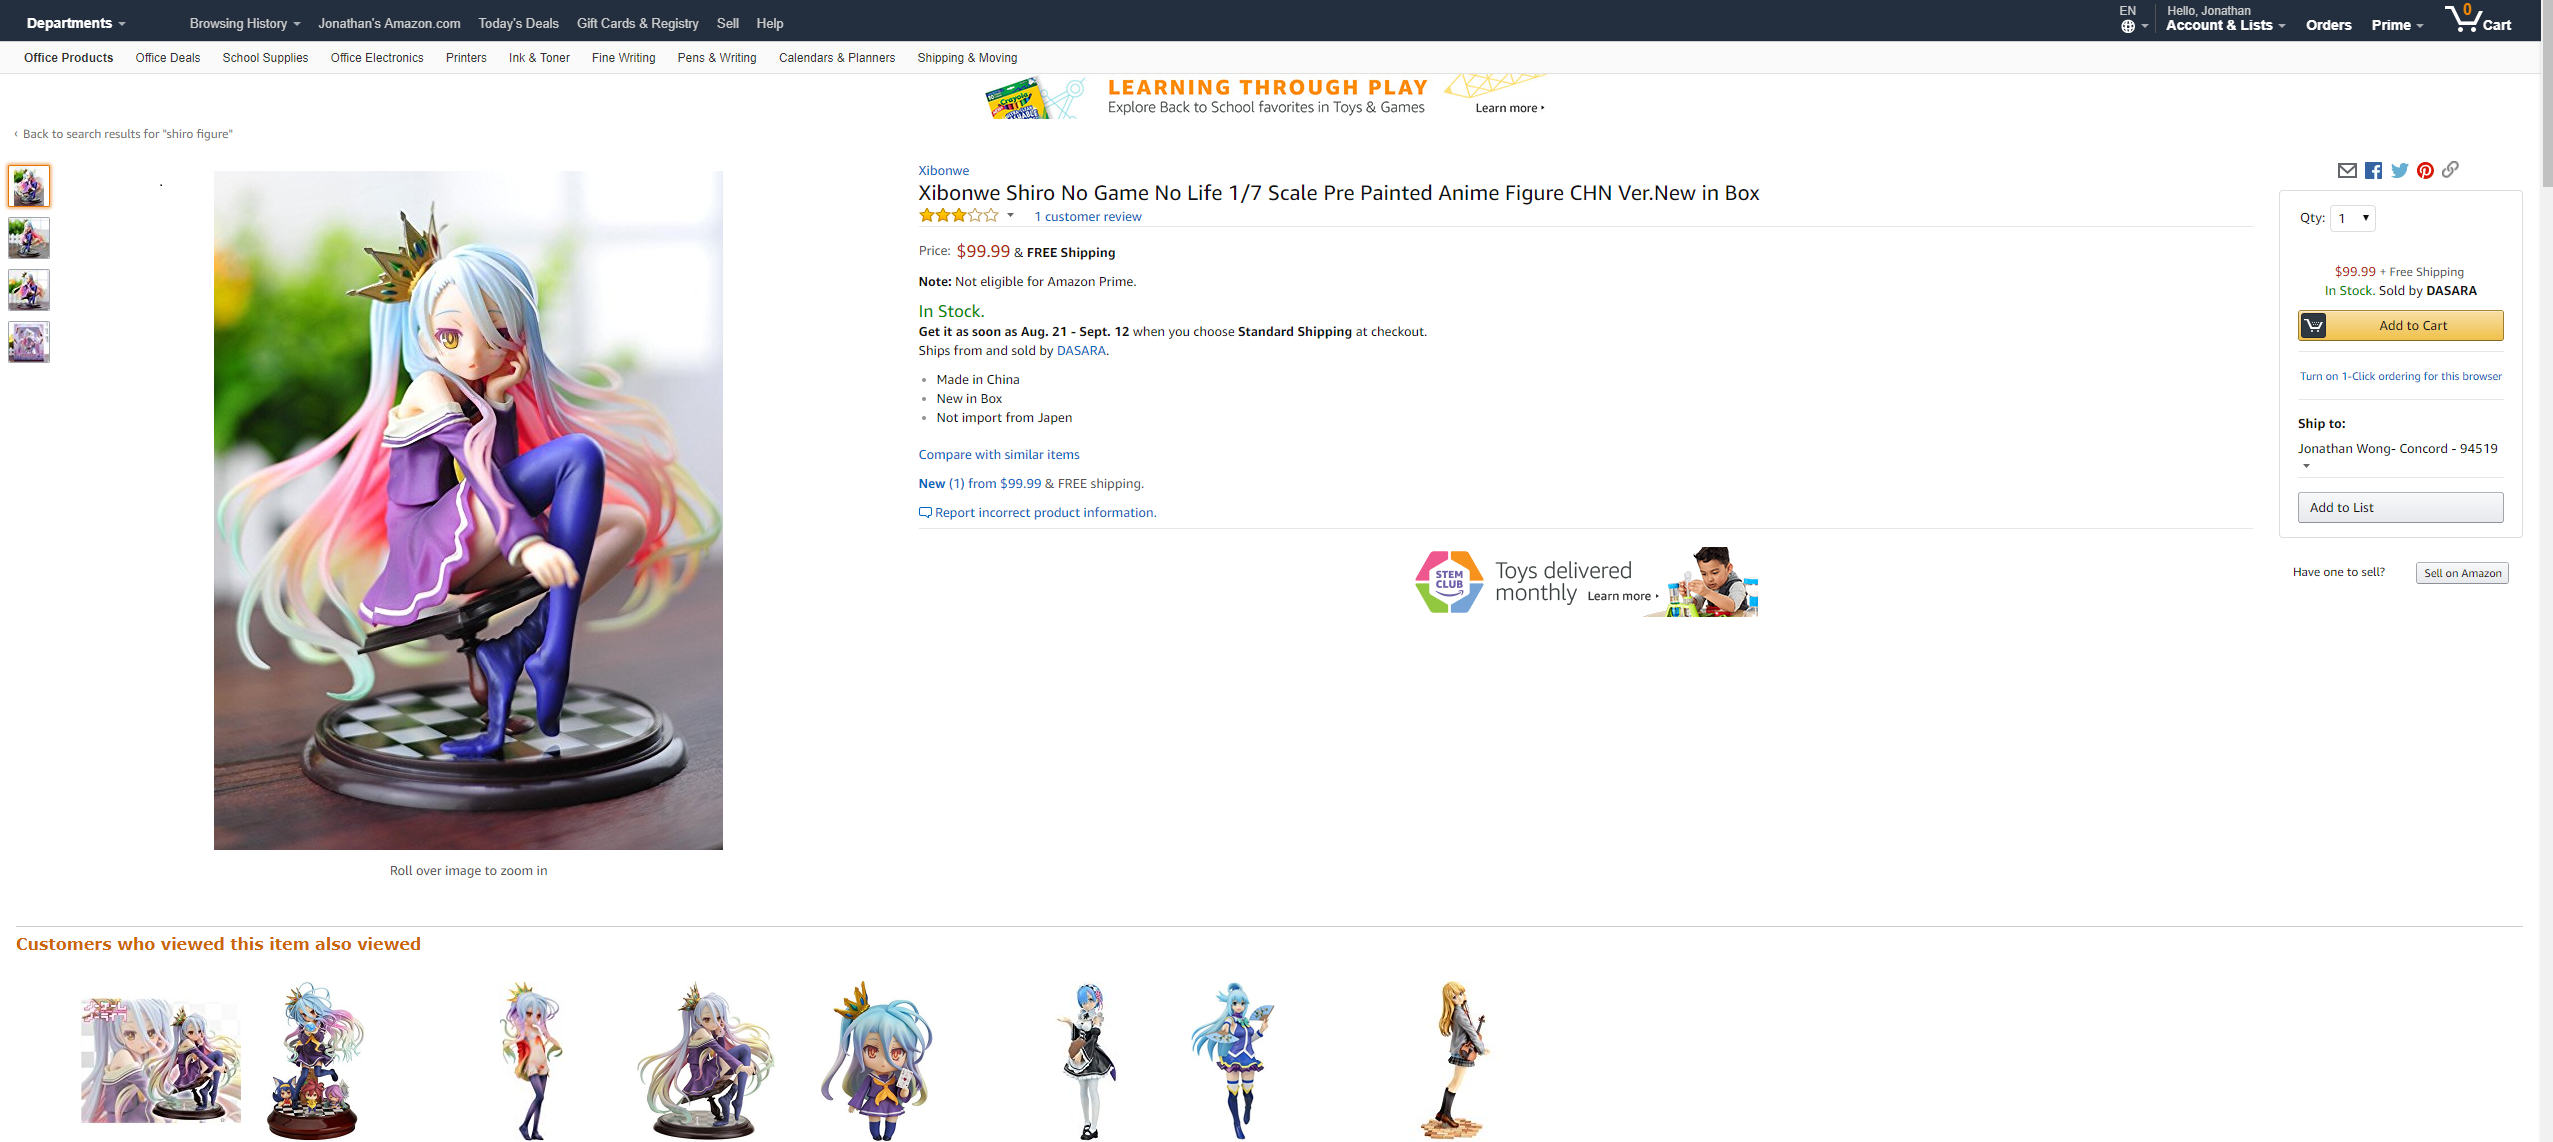 Guide] Buying Figures from Amazon and Avoiding Bootlegs – Waifu Laifu